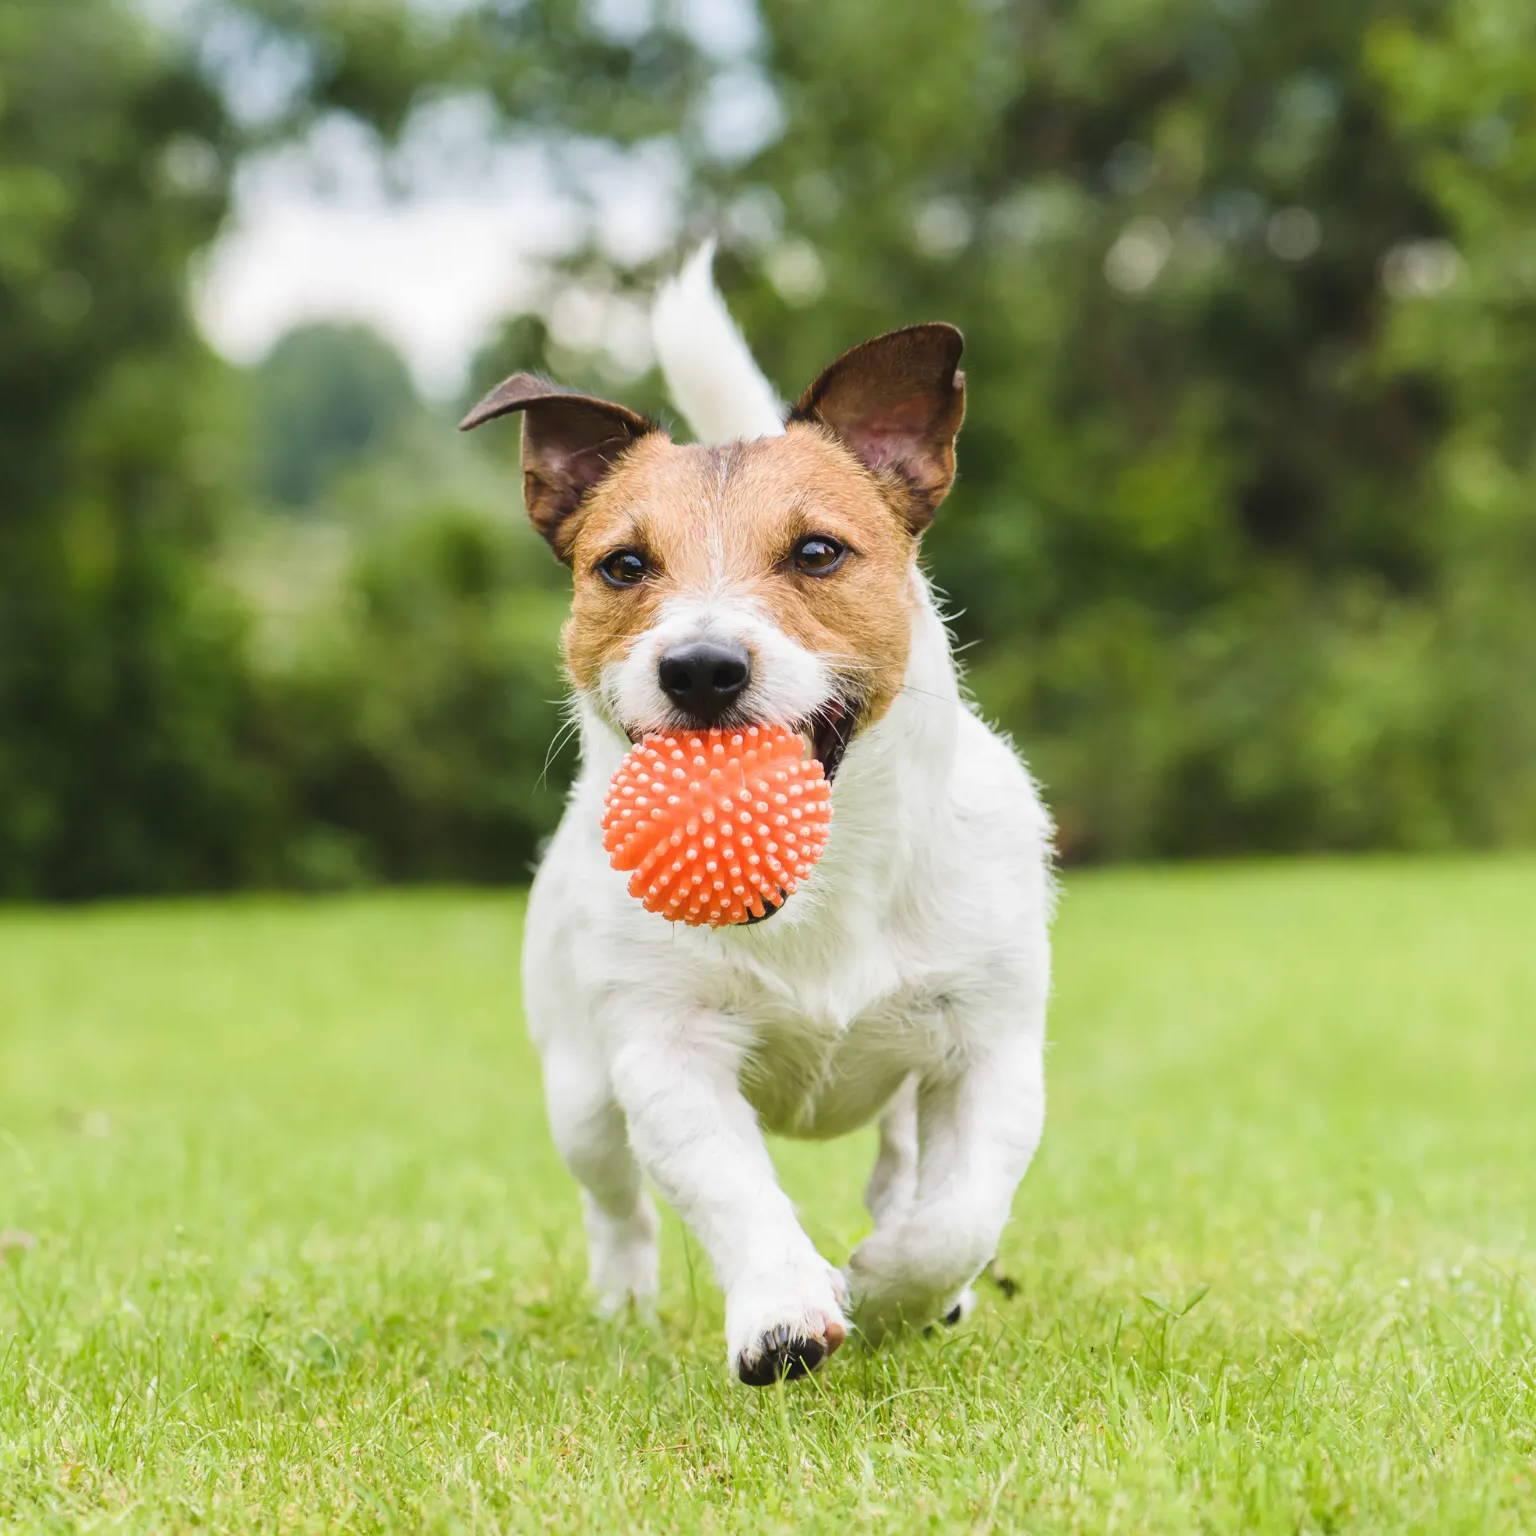 dog fetching a ball back